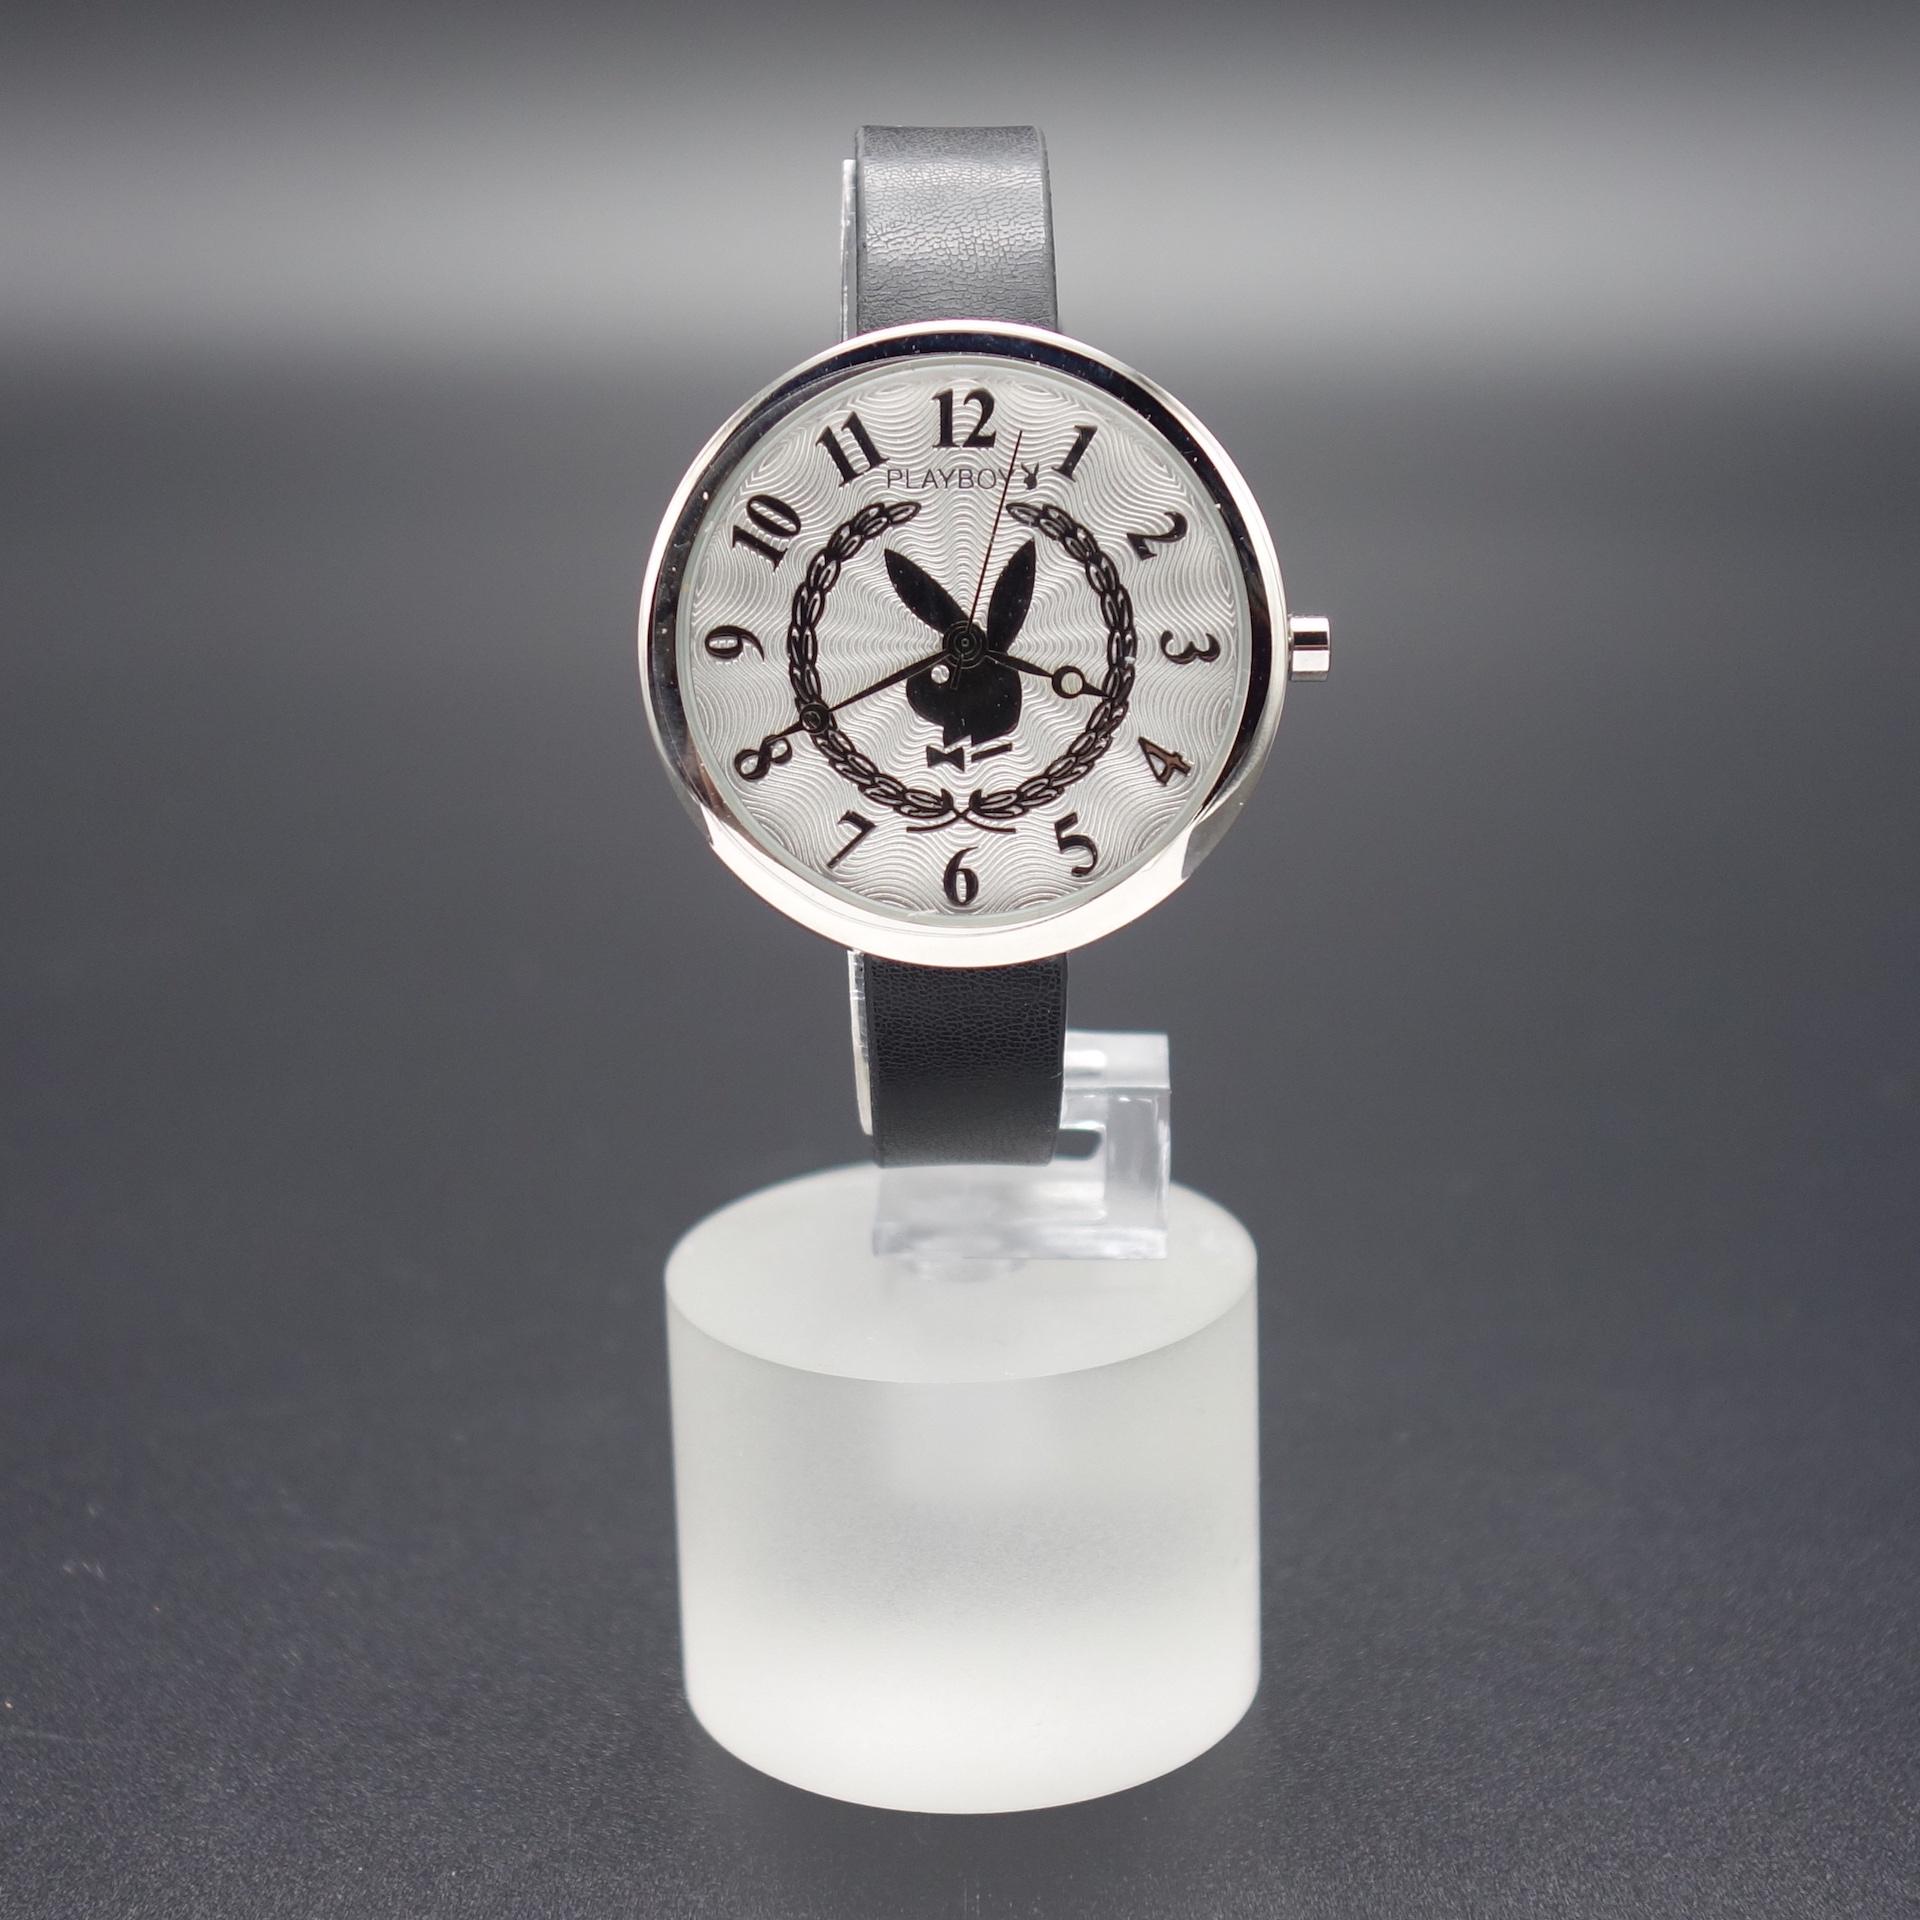 Playboy Damen Armbanduhr PBH0496SLBK Schwarz